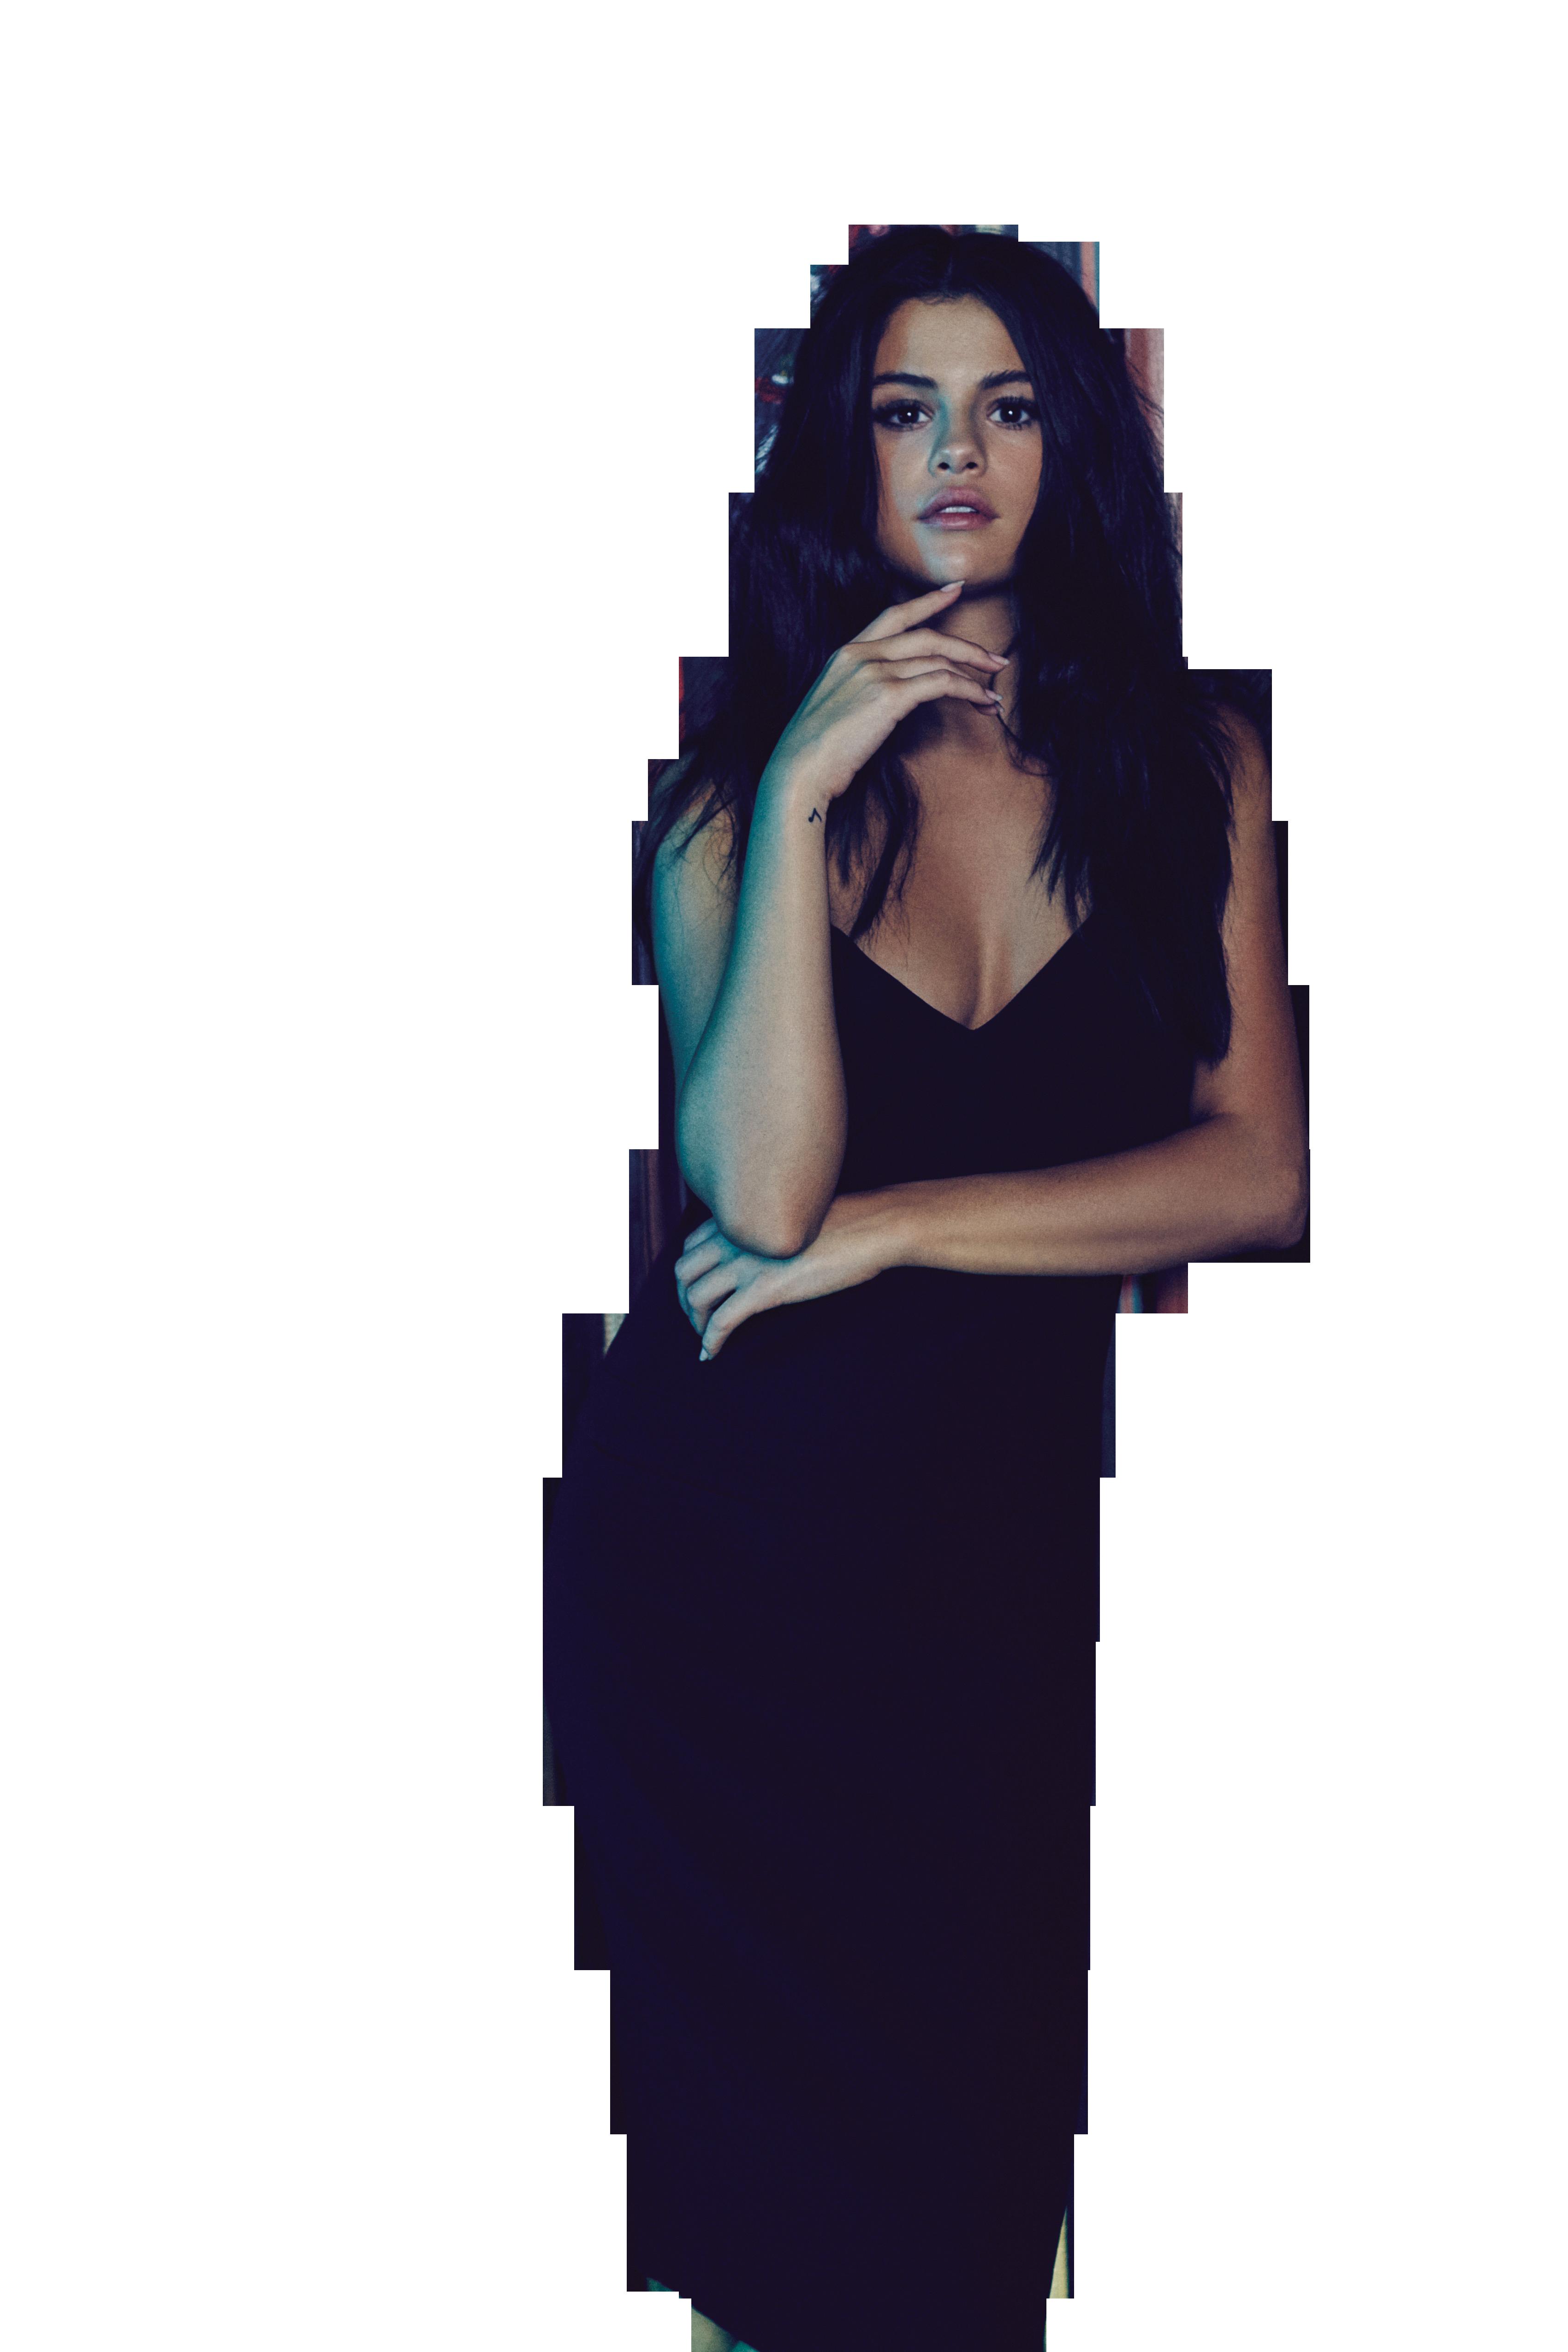 Selena Gomez Looking Attractive PNG Image